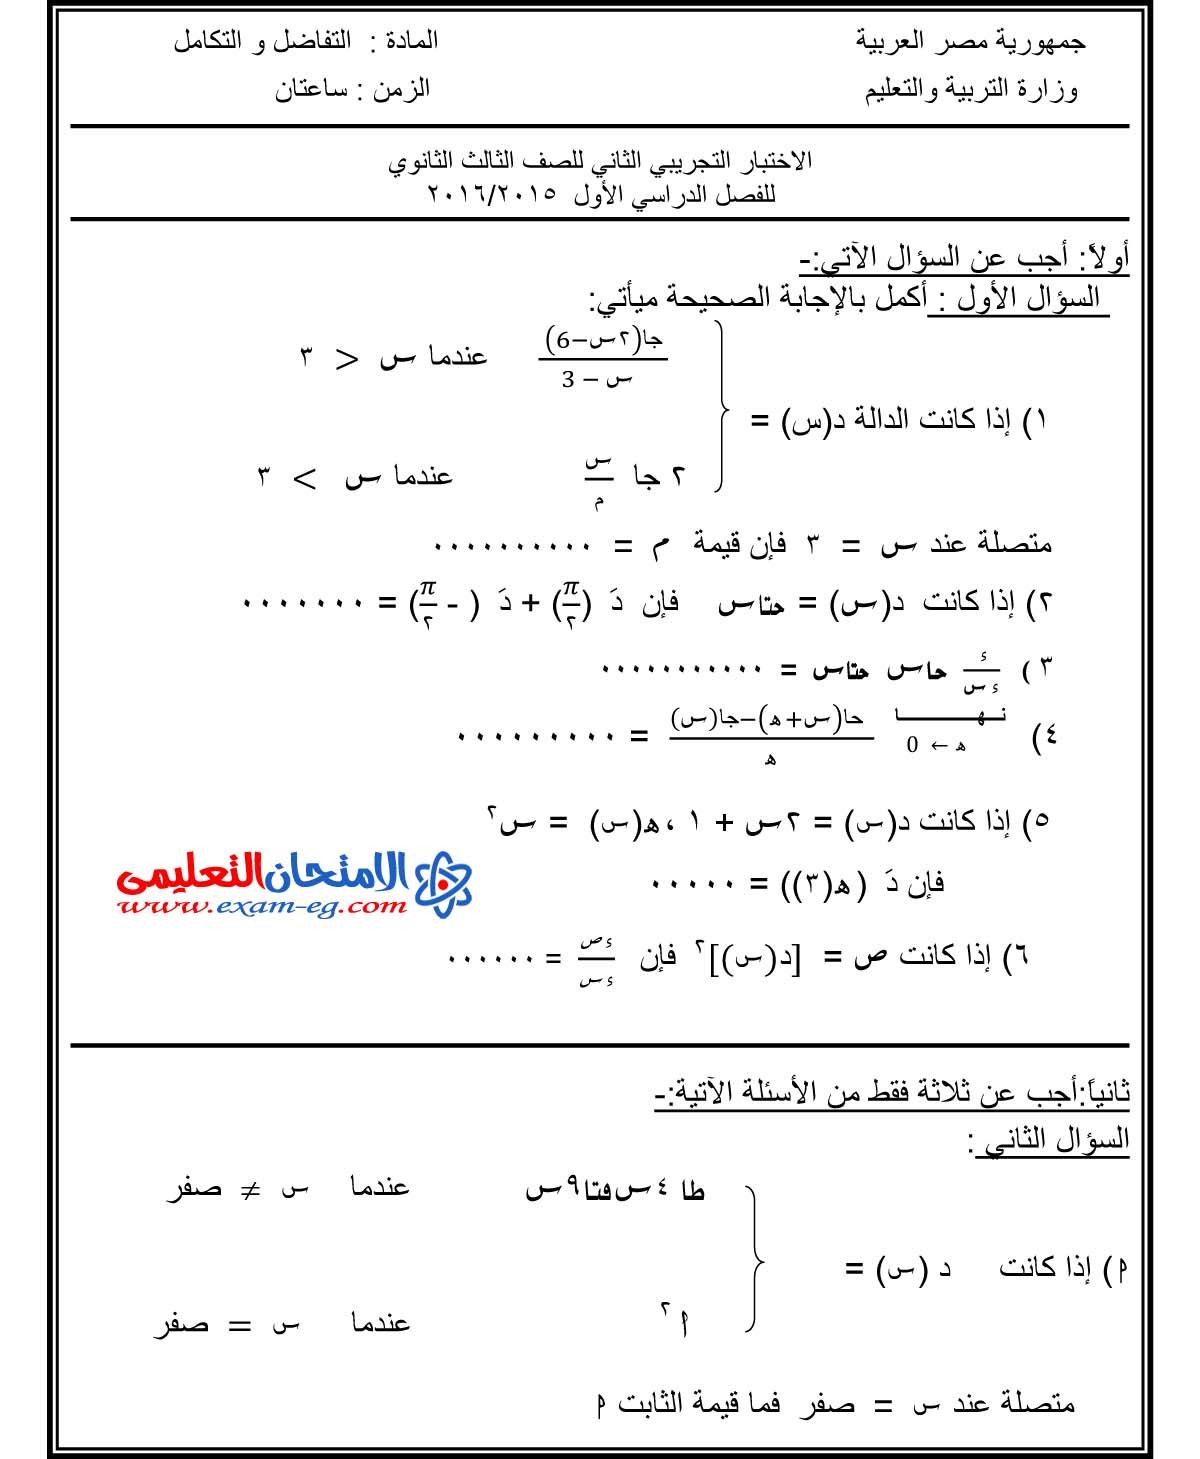 exam-eg.com_1460419970663.jpg